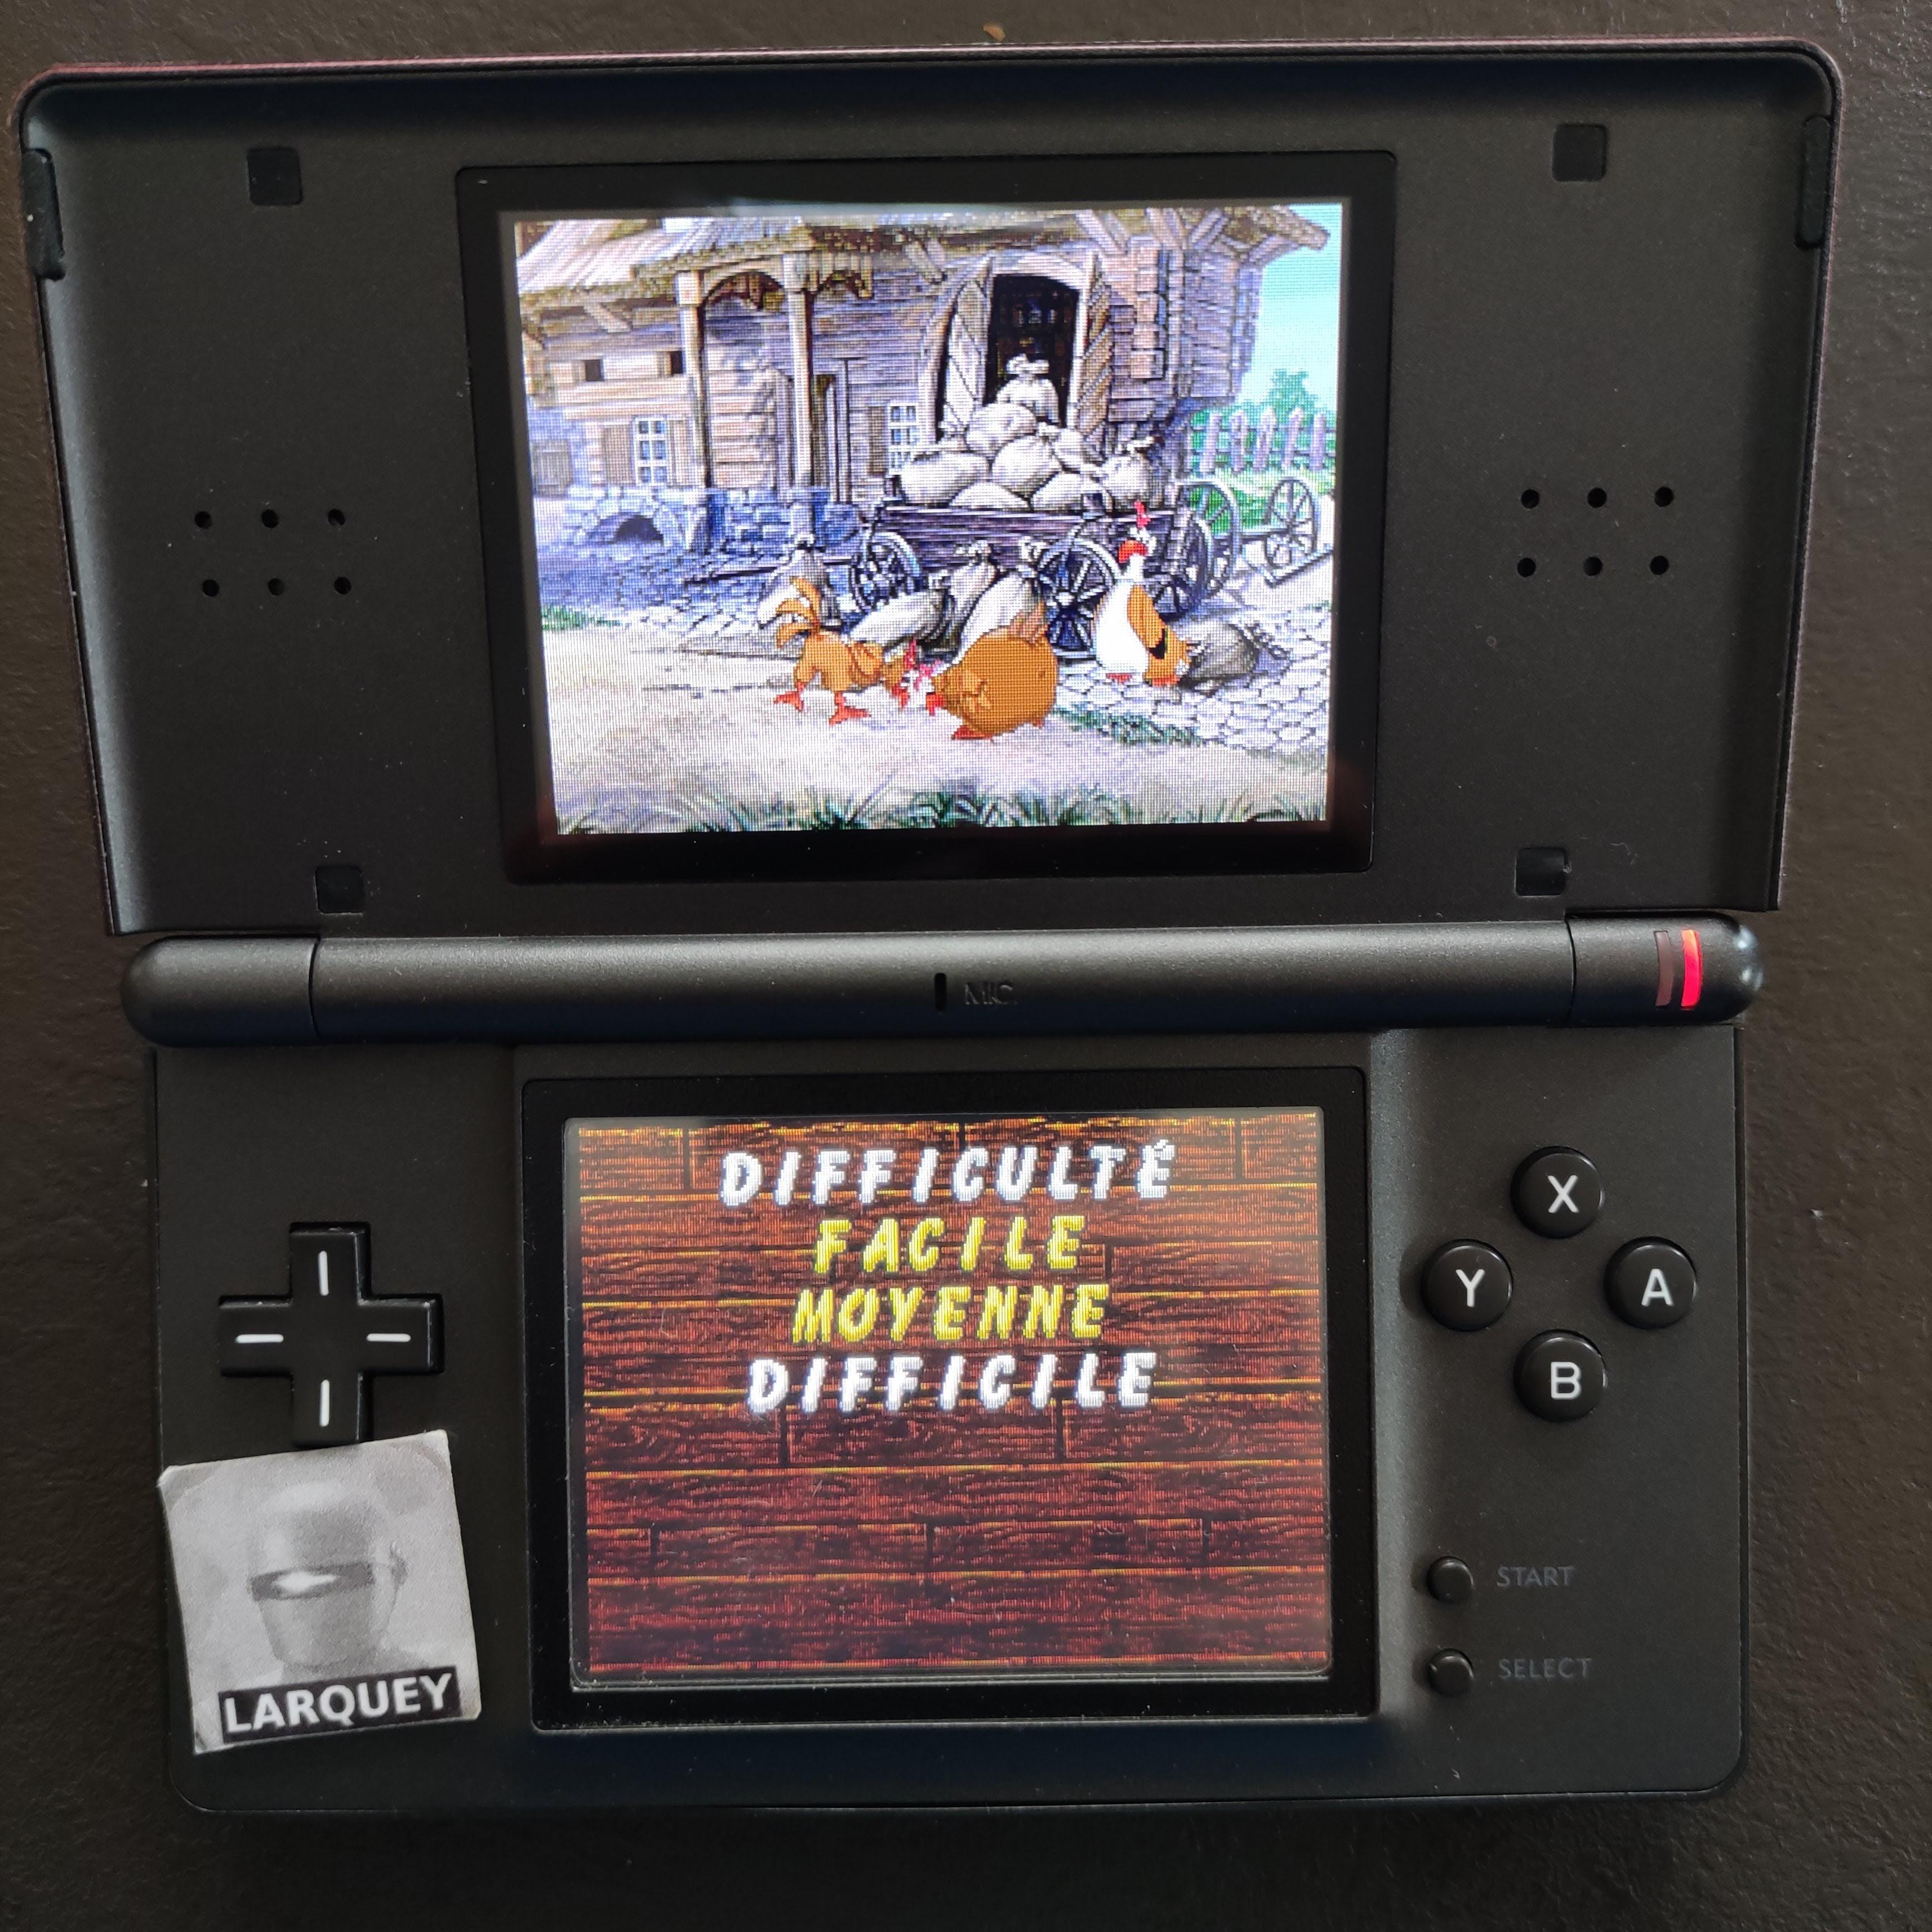 Larquey: Chicken Shoot [Classic: Hard] (Nintendo DS) 1,345 points on 2020-09-27 03:40:19